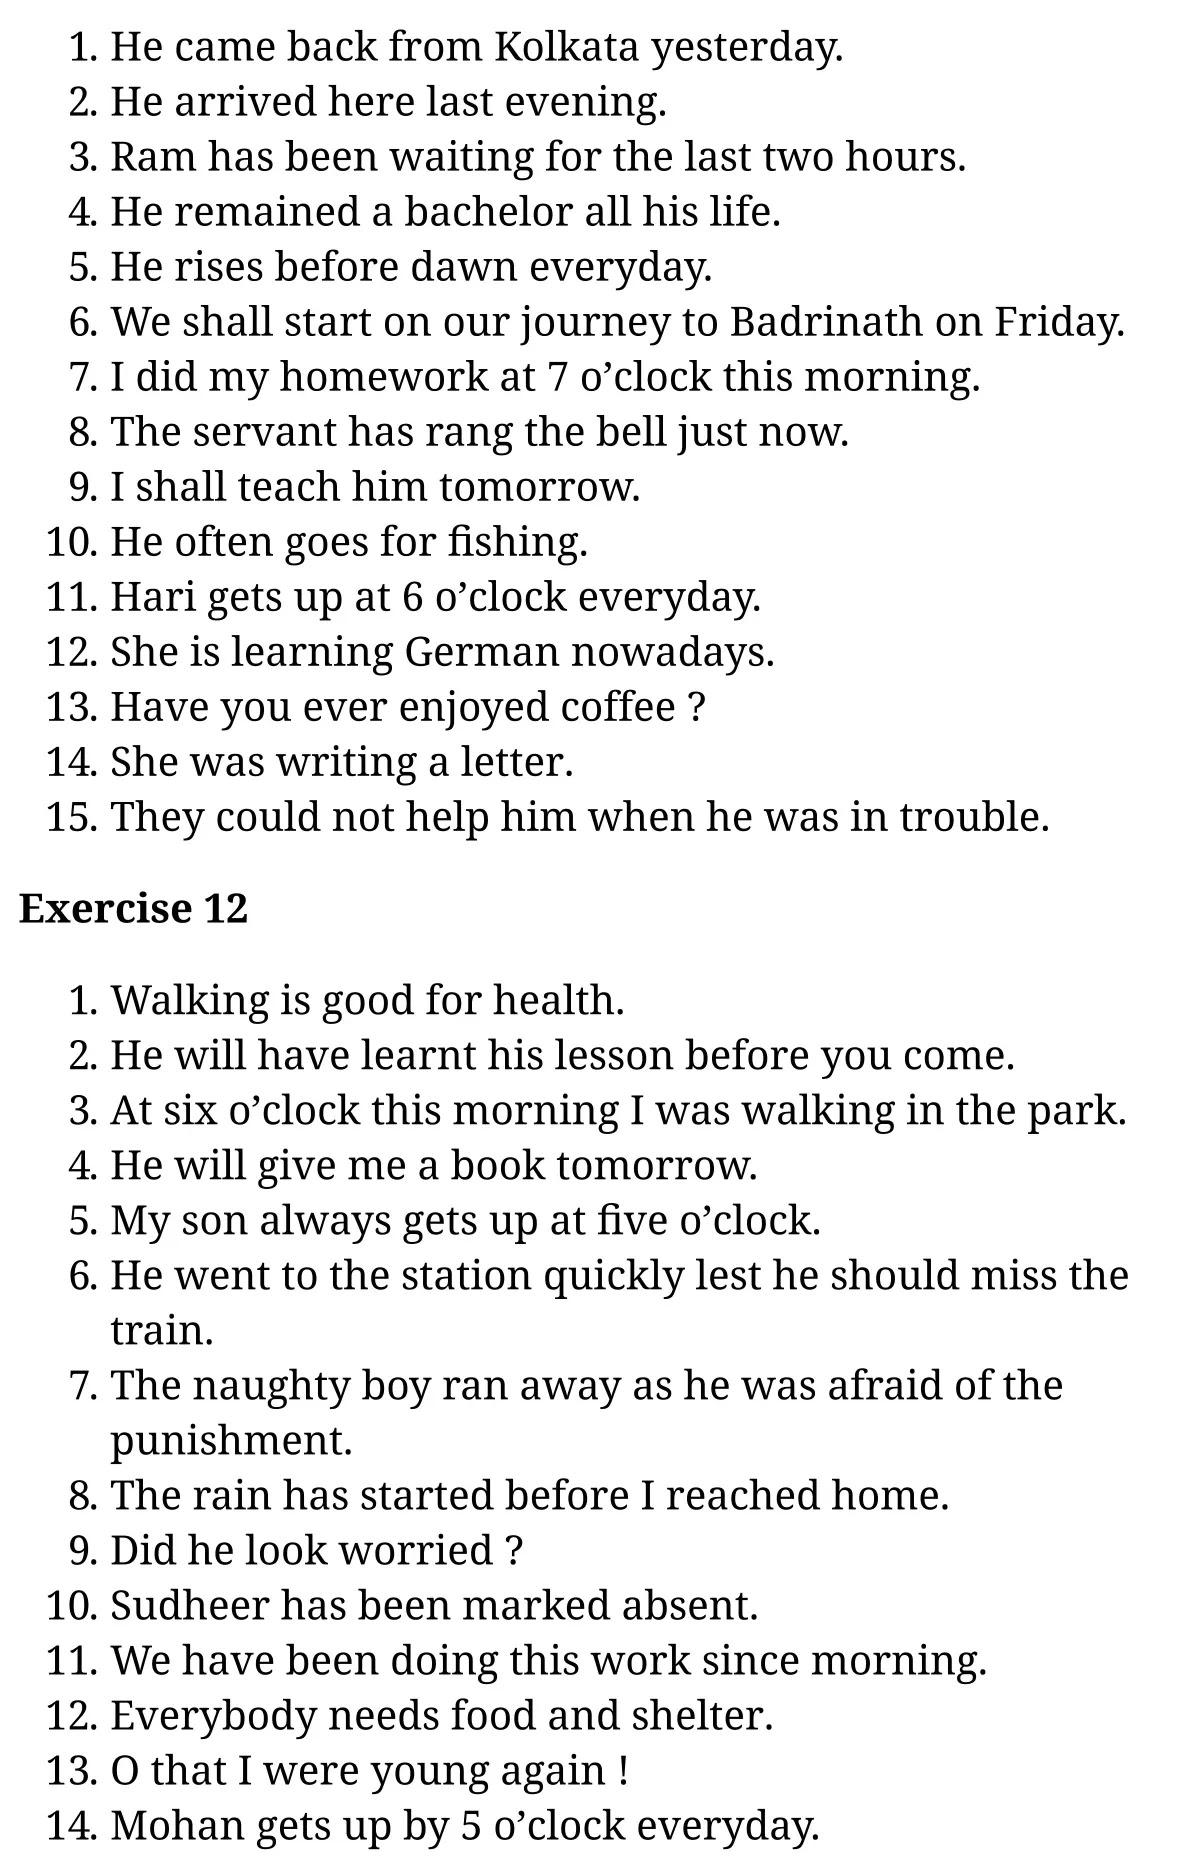 कक्षा 10 अंग्रेज़ी  के नोट्स  हिंदी में एनसीईआरटी समाधान,     class 10 English Grammar Tenses and Their Uses (Active Voice),   class 10 English Grammar Tenses and Their Uses (Active Voice) ncert solutions in English Grammar,  class 10 English Grammar Tenses and Their Uses (Active Voice) notes in hindi,   class 10 English Grammar Tenses and Their Uses (Active Voice) question answer,   class 10 English Grammar Tenses and Their Uses (Active Voice) notes,   class 10 English Grammar Tenses and Their Uses (Active Voice) class 10 English Grammar  Tenses and Their Uses (Active Voice) in  hindi,    class 10 English Grammar Tenses and Their Uses (Active Voice) important questions in  hindi,   class 10 English Grammar hindi  Tenses and Their Uses (Active Voice) notes in hindi,   class 10 English Grammar  Tenses and Their Uses (Active Voice) test,   class 10 English Grammar  Tenses and Their Uses (Active Voice) class 10 English Grammar  Tenses and Their Uses (Active Voice) pdf,   class 10 English Grammar  Tenses and Their Uses (Active Voice) notes pdf,   class 10 English Grammar  Tenses and Their Uses (Active Voice) exercise solutions,  class 10 English Grammar  Tenses and Their Uses (Active Voice),  class 10 English Grammar  Tenses and Their Uses (Active Voice) notes study rankers,  class 10 English Grammar  Tenses and Their Uses (Active Voice) notes,   class 10 English Grammar hindi  Tenses and Their Uses (Active Voice) notes,    class 10 English Grammar   Tenses and Their Uses (Active Voice)  class 10  notes pdf,  class 10 English Grammar  Tenses and Their Uses (Active Voice) class 10  notes  ncert,  class 10 English Grammar  Tenses and Their Uses (Active Voice) class 10 pdf,   class 10 English Grammar  Tenses and Their Uses (Active Voice)  book,   class 10 English Grammar  Tenses and Their Uses (Active Voice) quiz class 10  ,   10  th class 10 English Grammar Tenses and Their Uses (Active Voice)  book up board,   up board 10  th class 10 English Grammar Tenses and Their Use